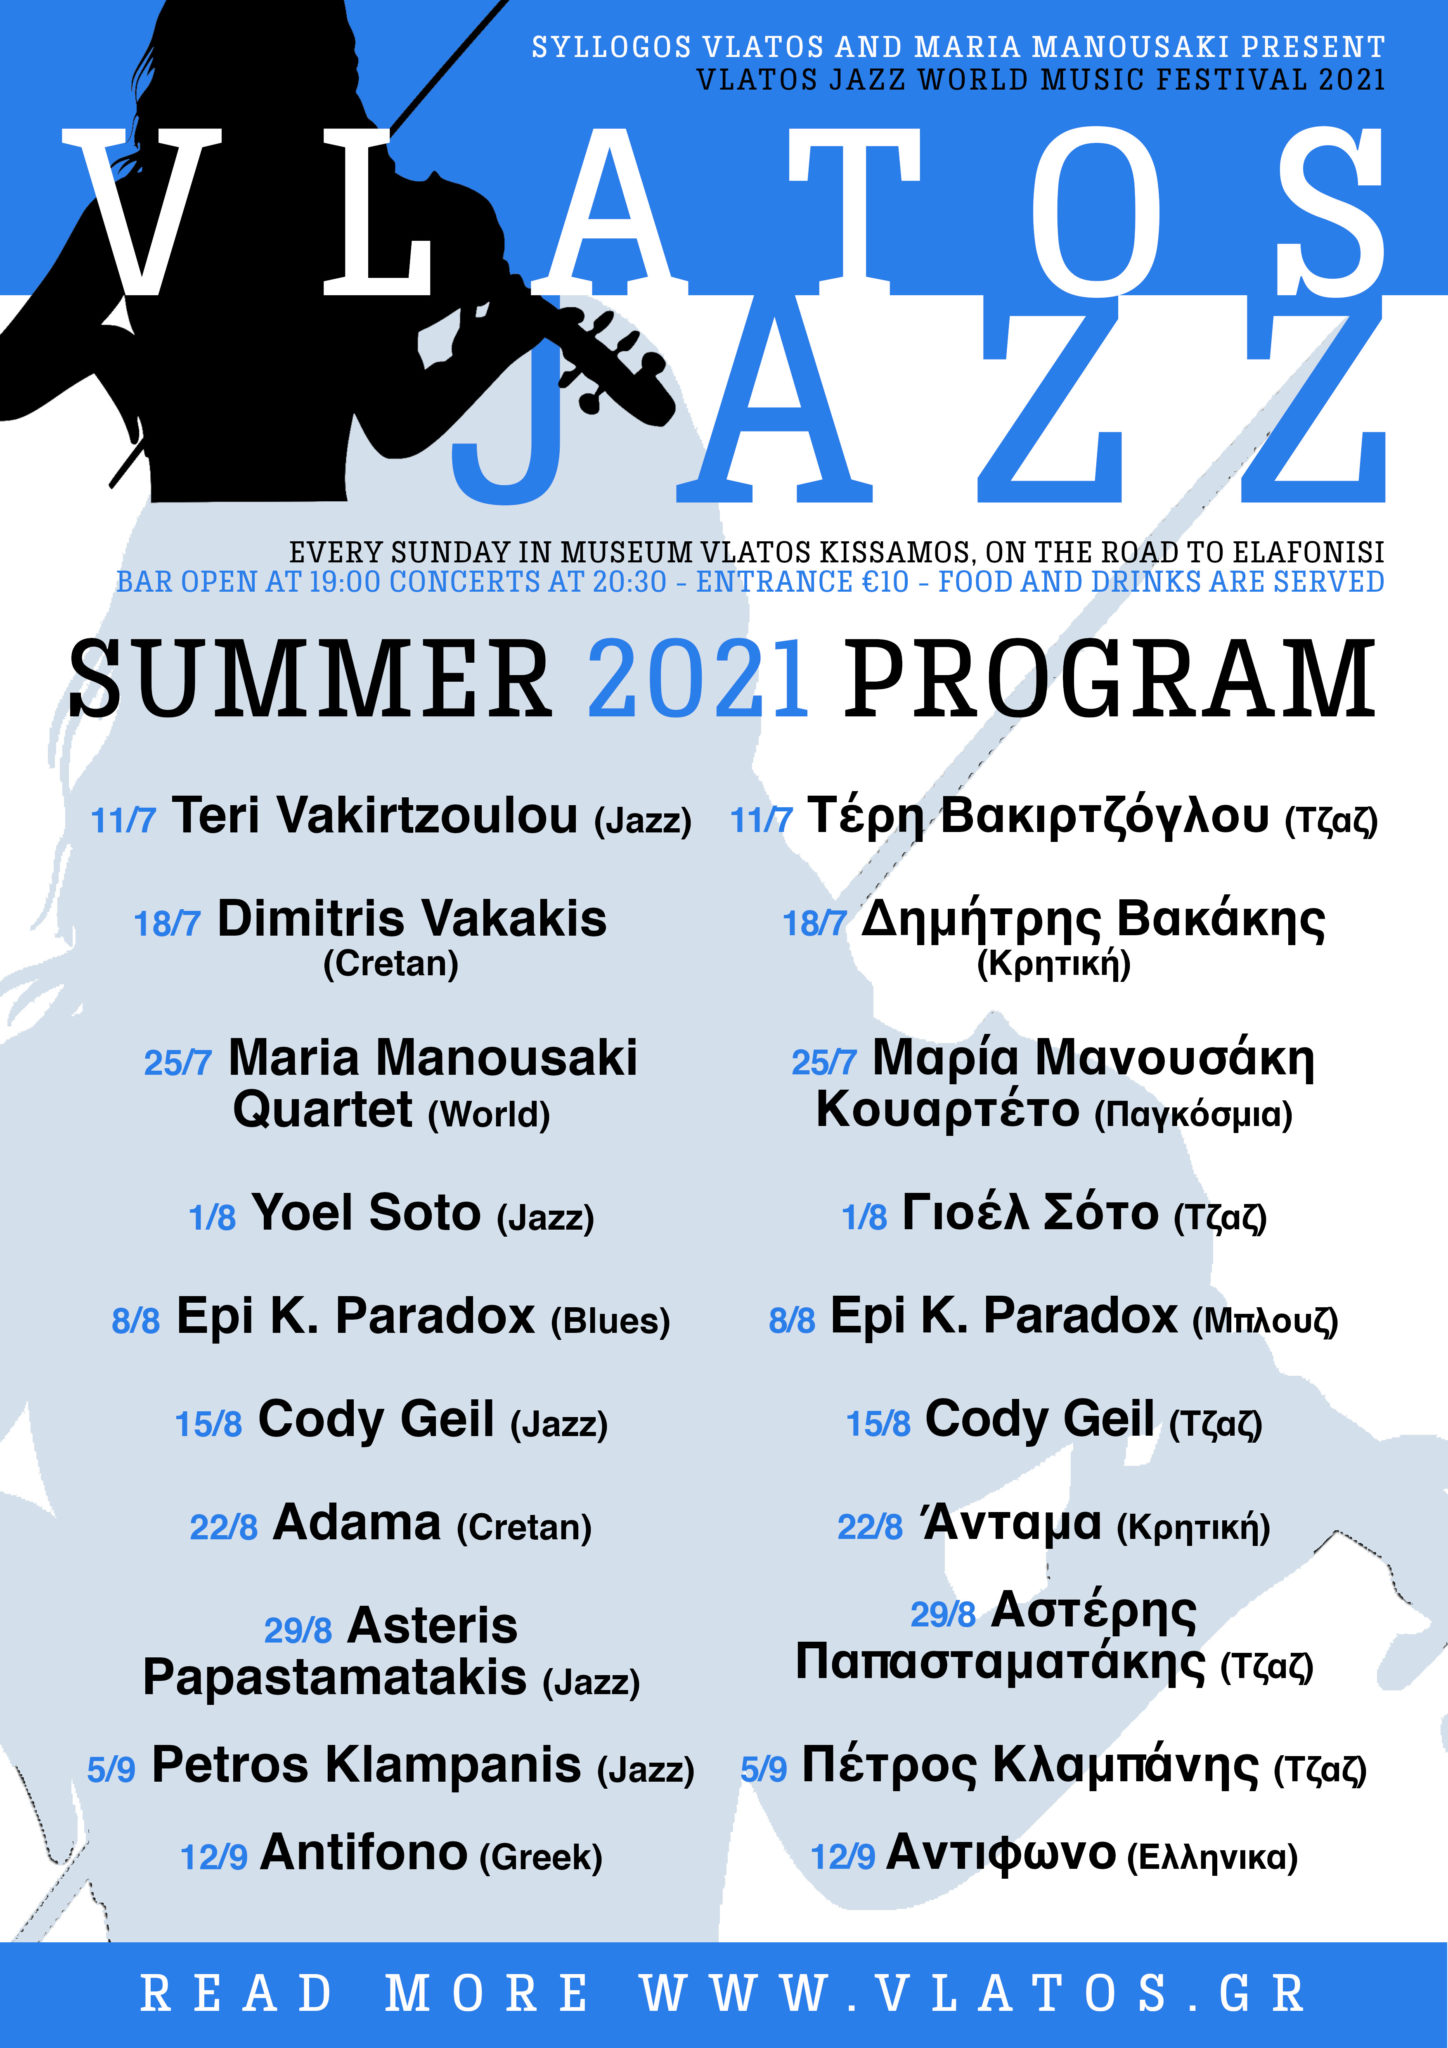 Vlatos Jazz 2021 Poster